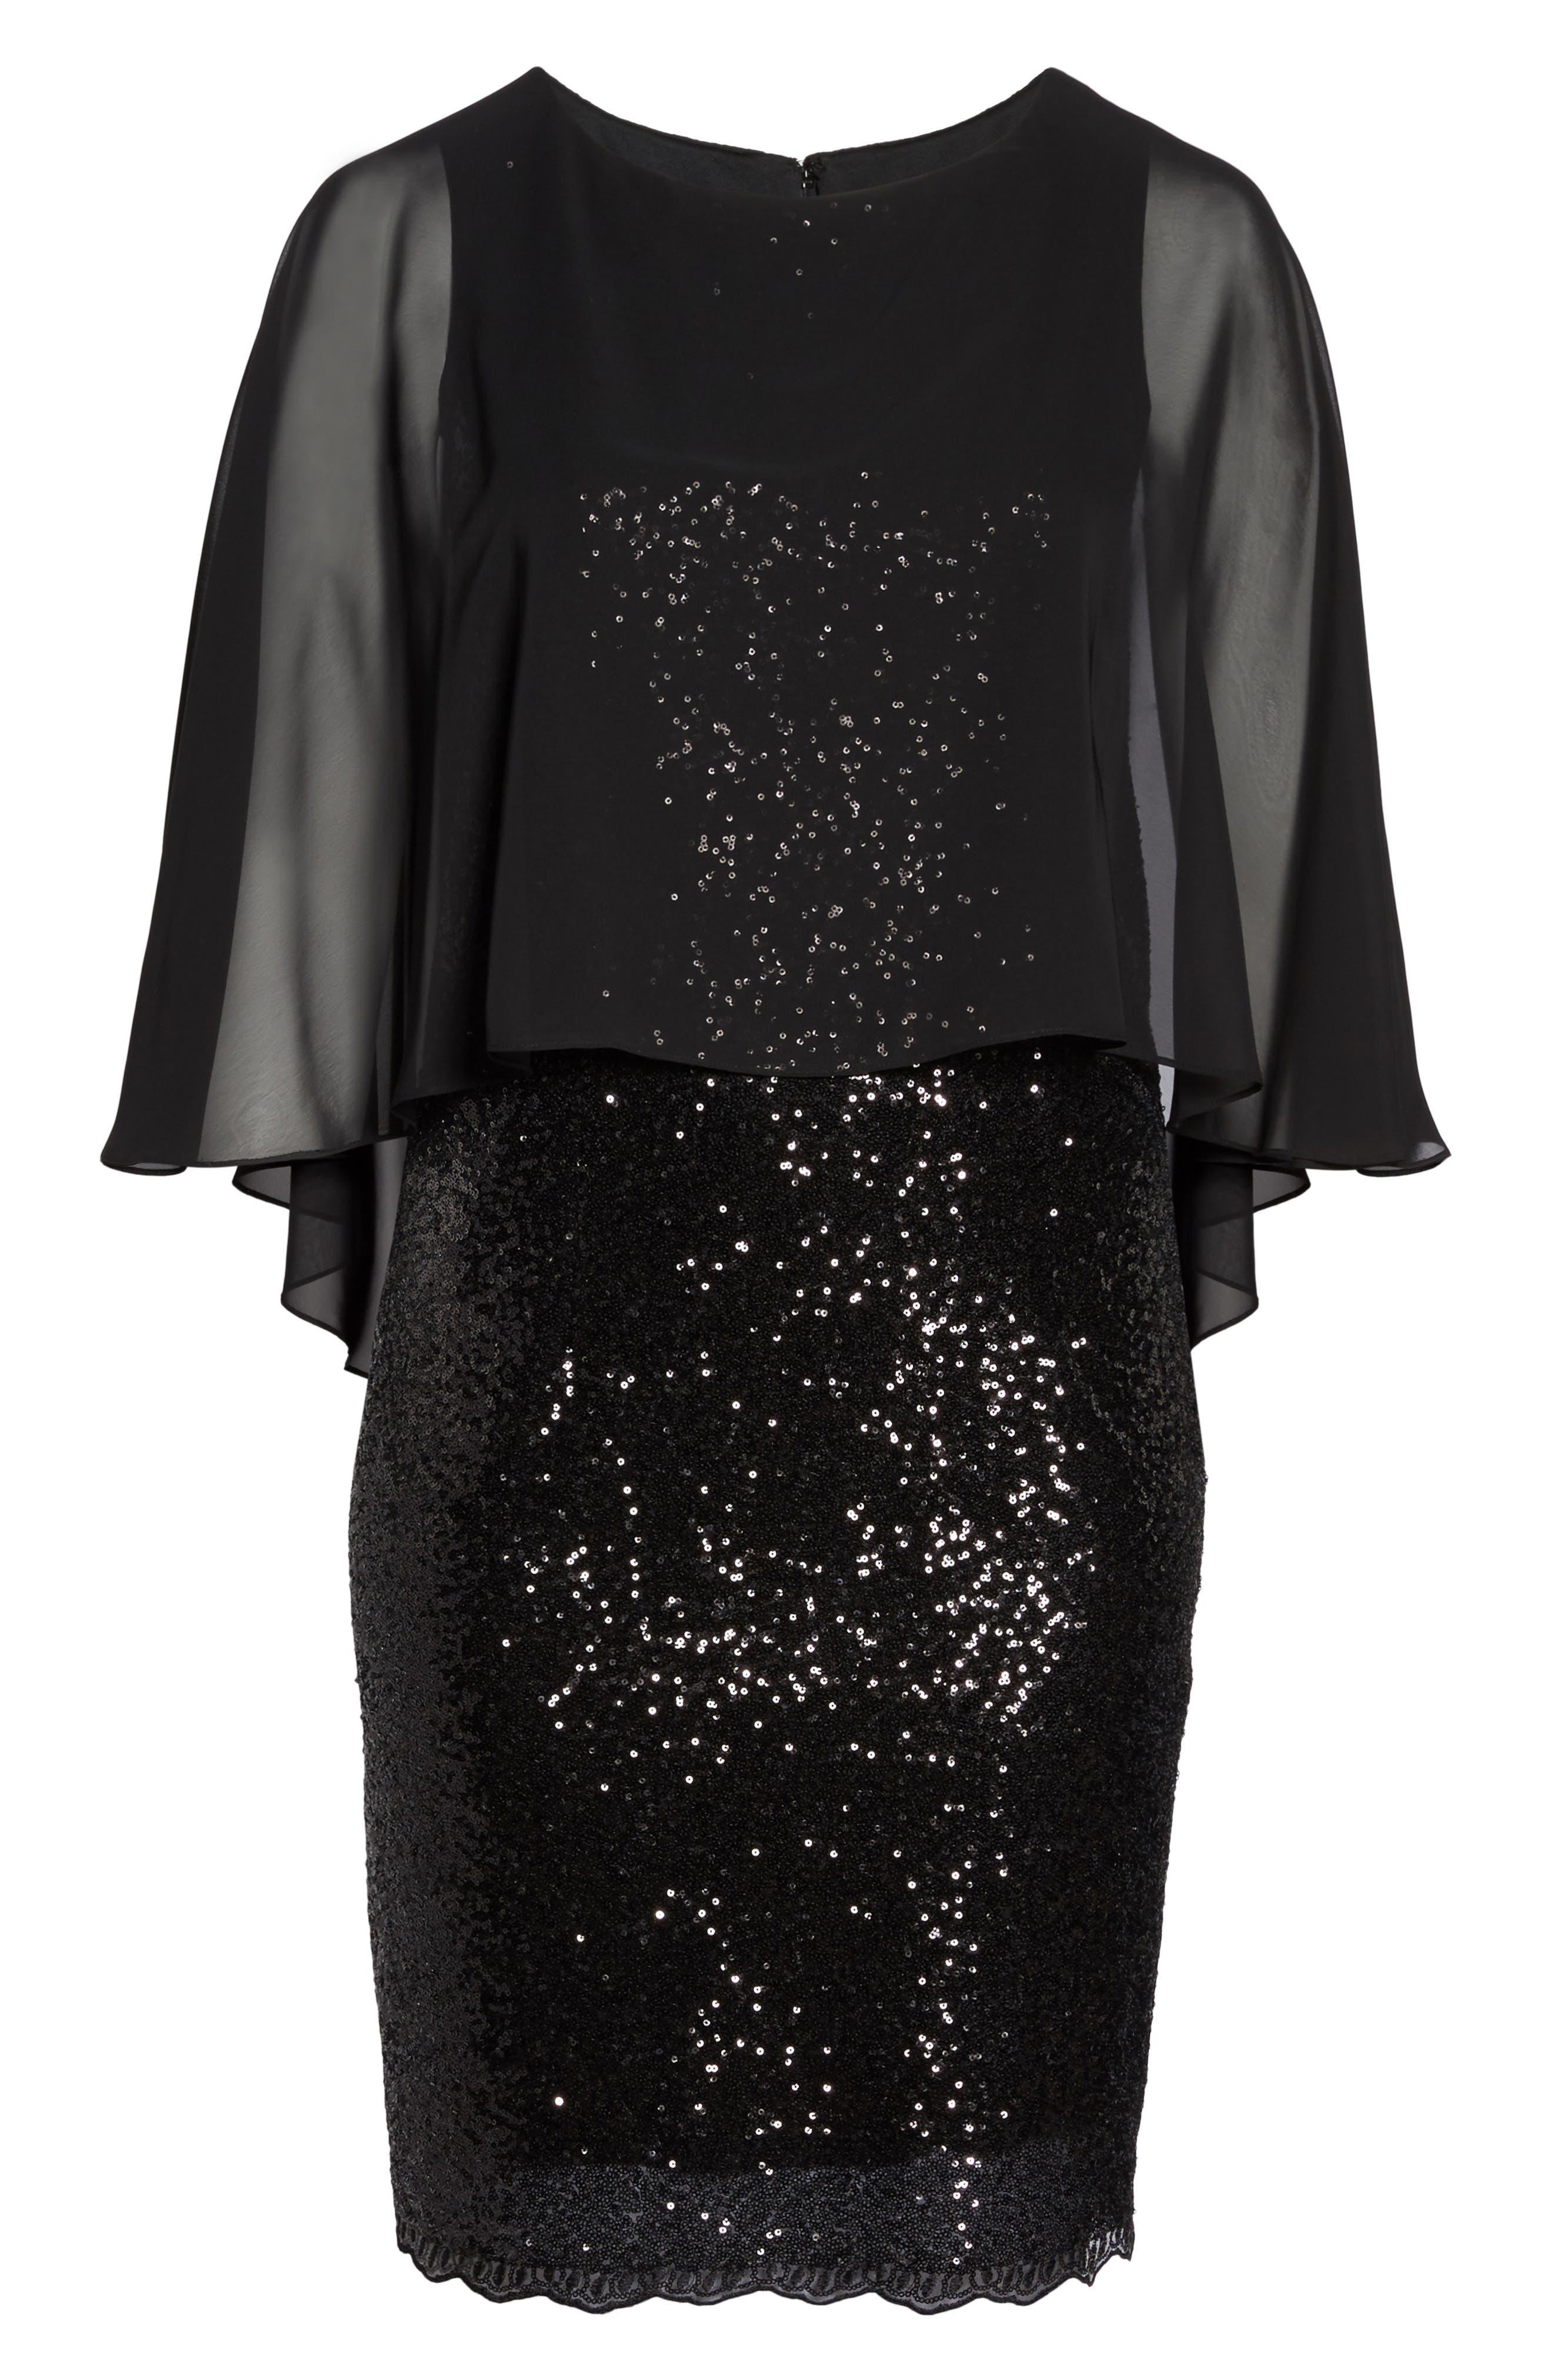 Capelet Sequin Shift Dress,                             Alternate thumbnail 6, color,                             001